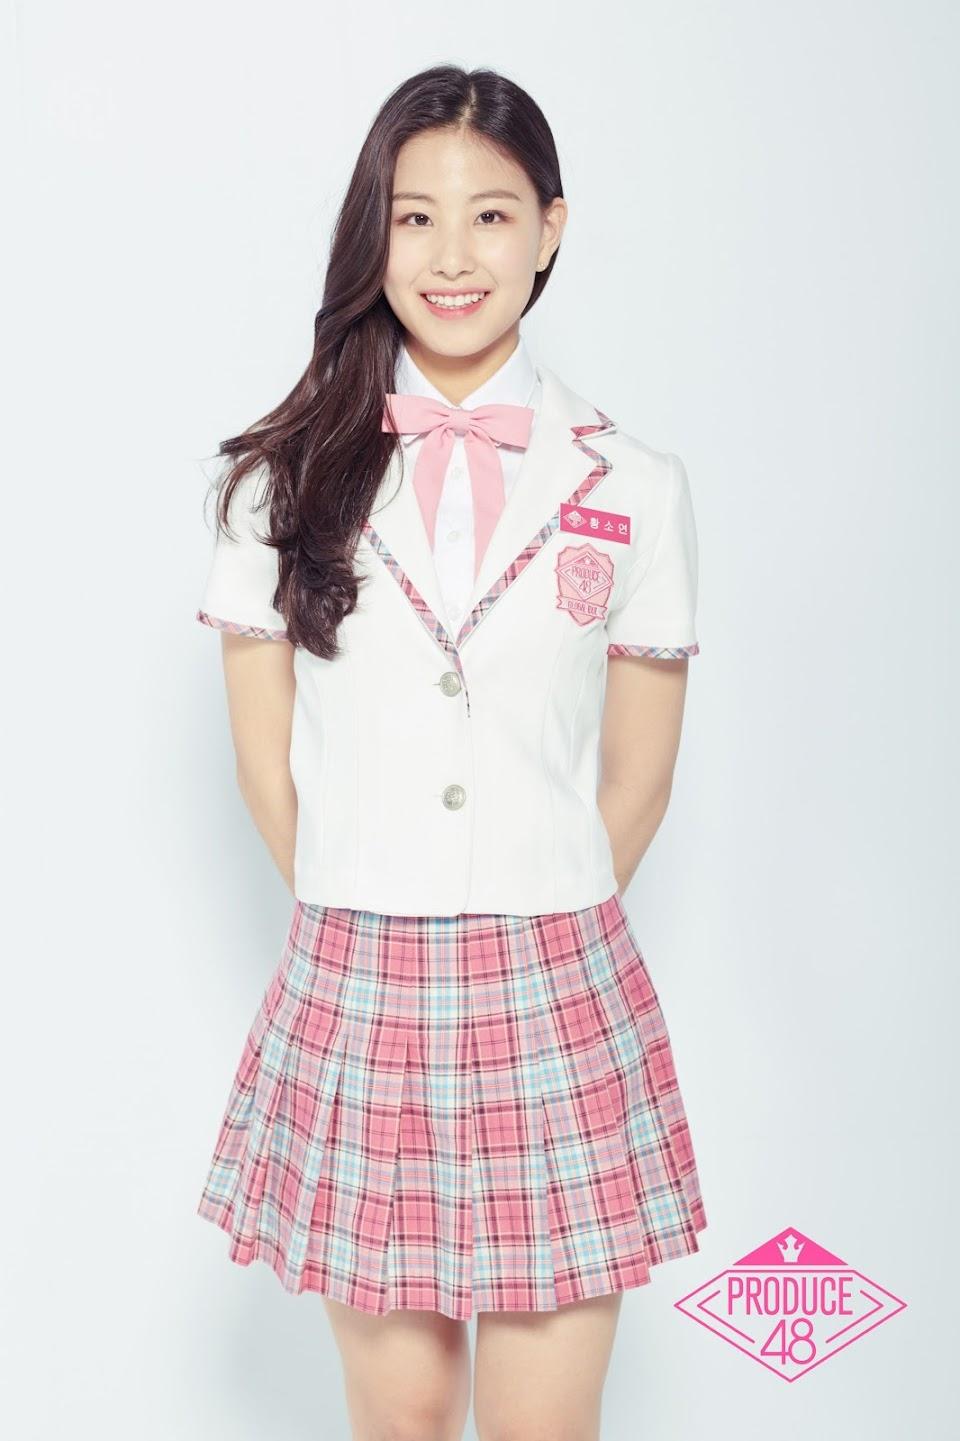 Hwang_Soyeon_Produce_48